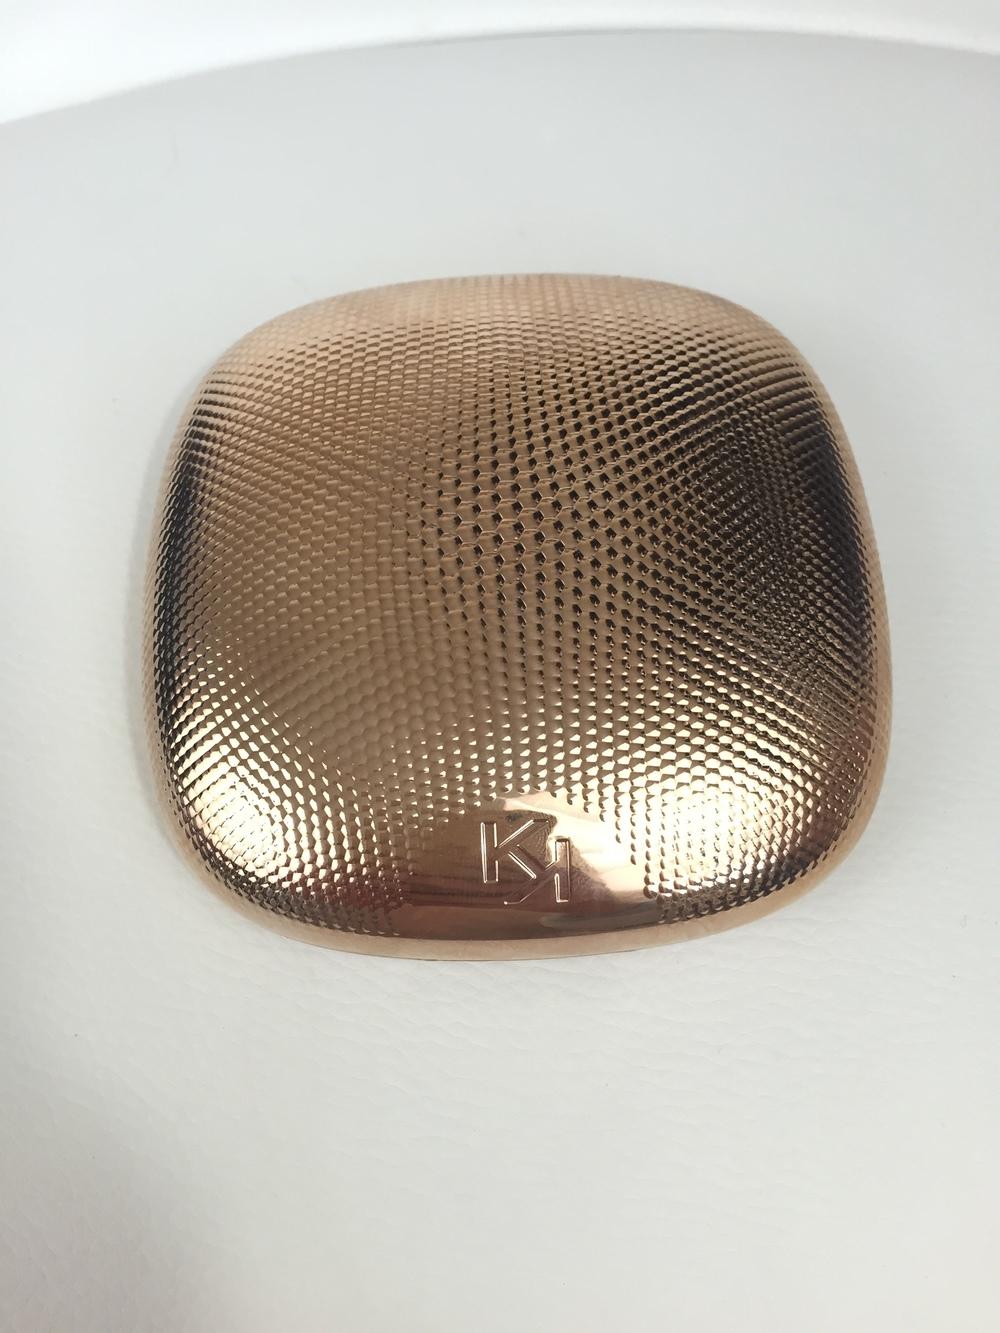 Kiko Milano Desert Dunes Baked Bronzer Case